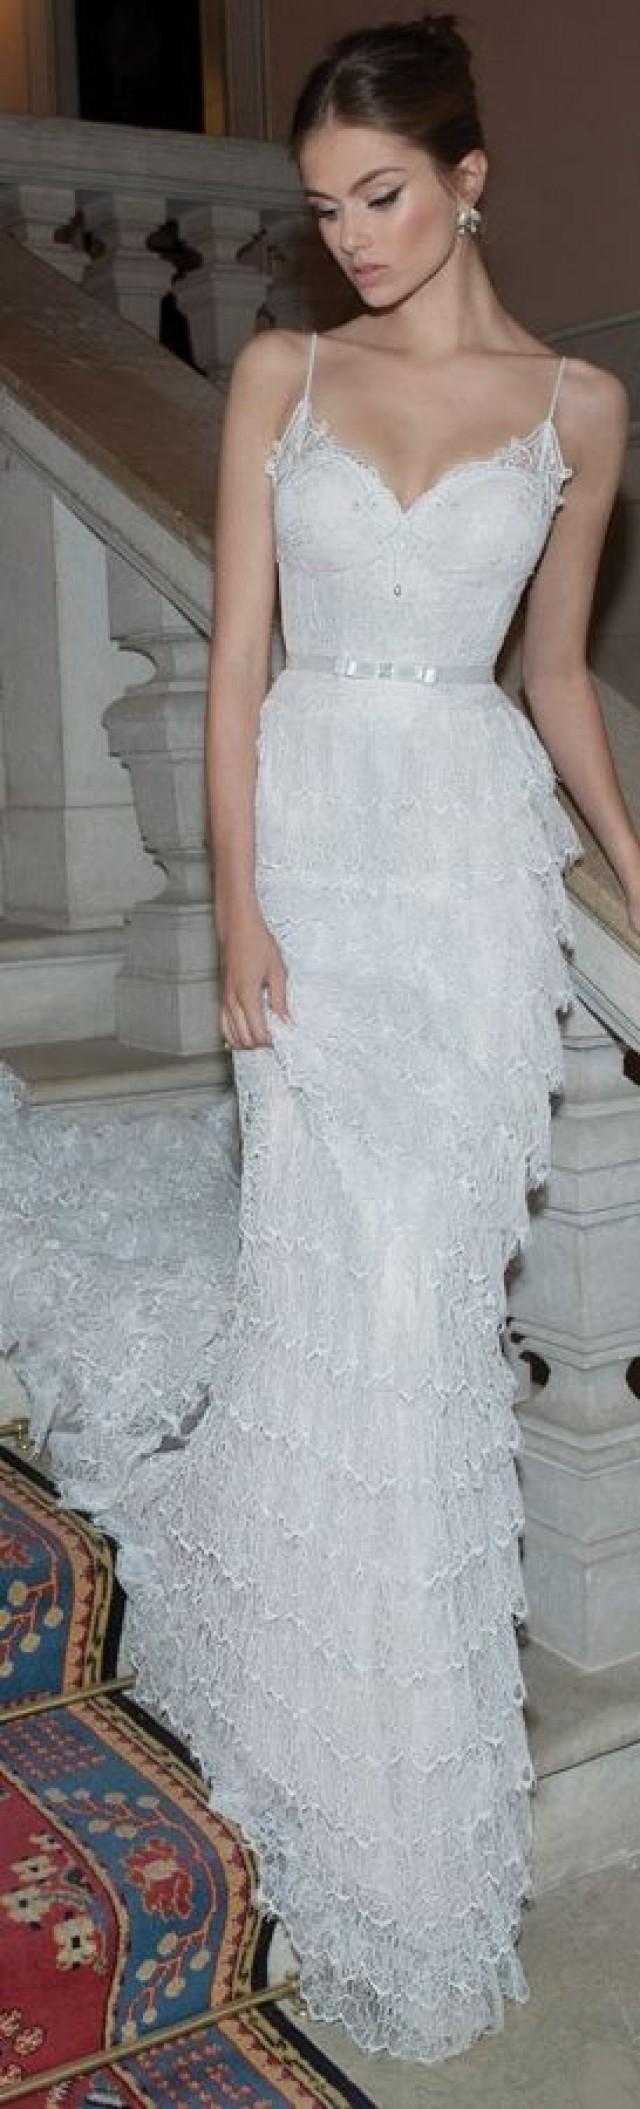 227 best Dress images on Pinterest | Bridal dresses, Dream wedding ...